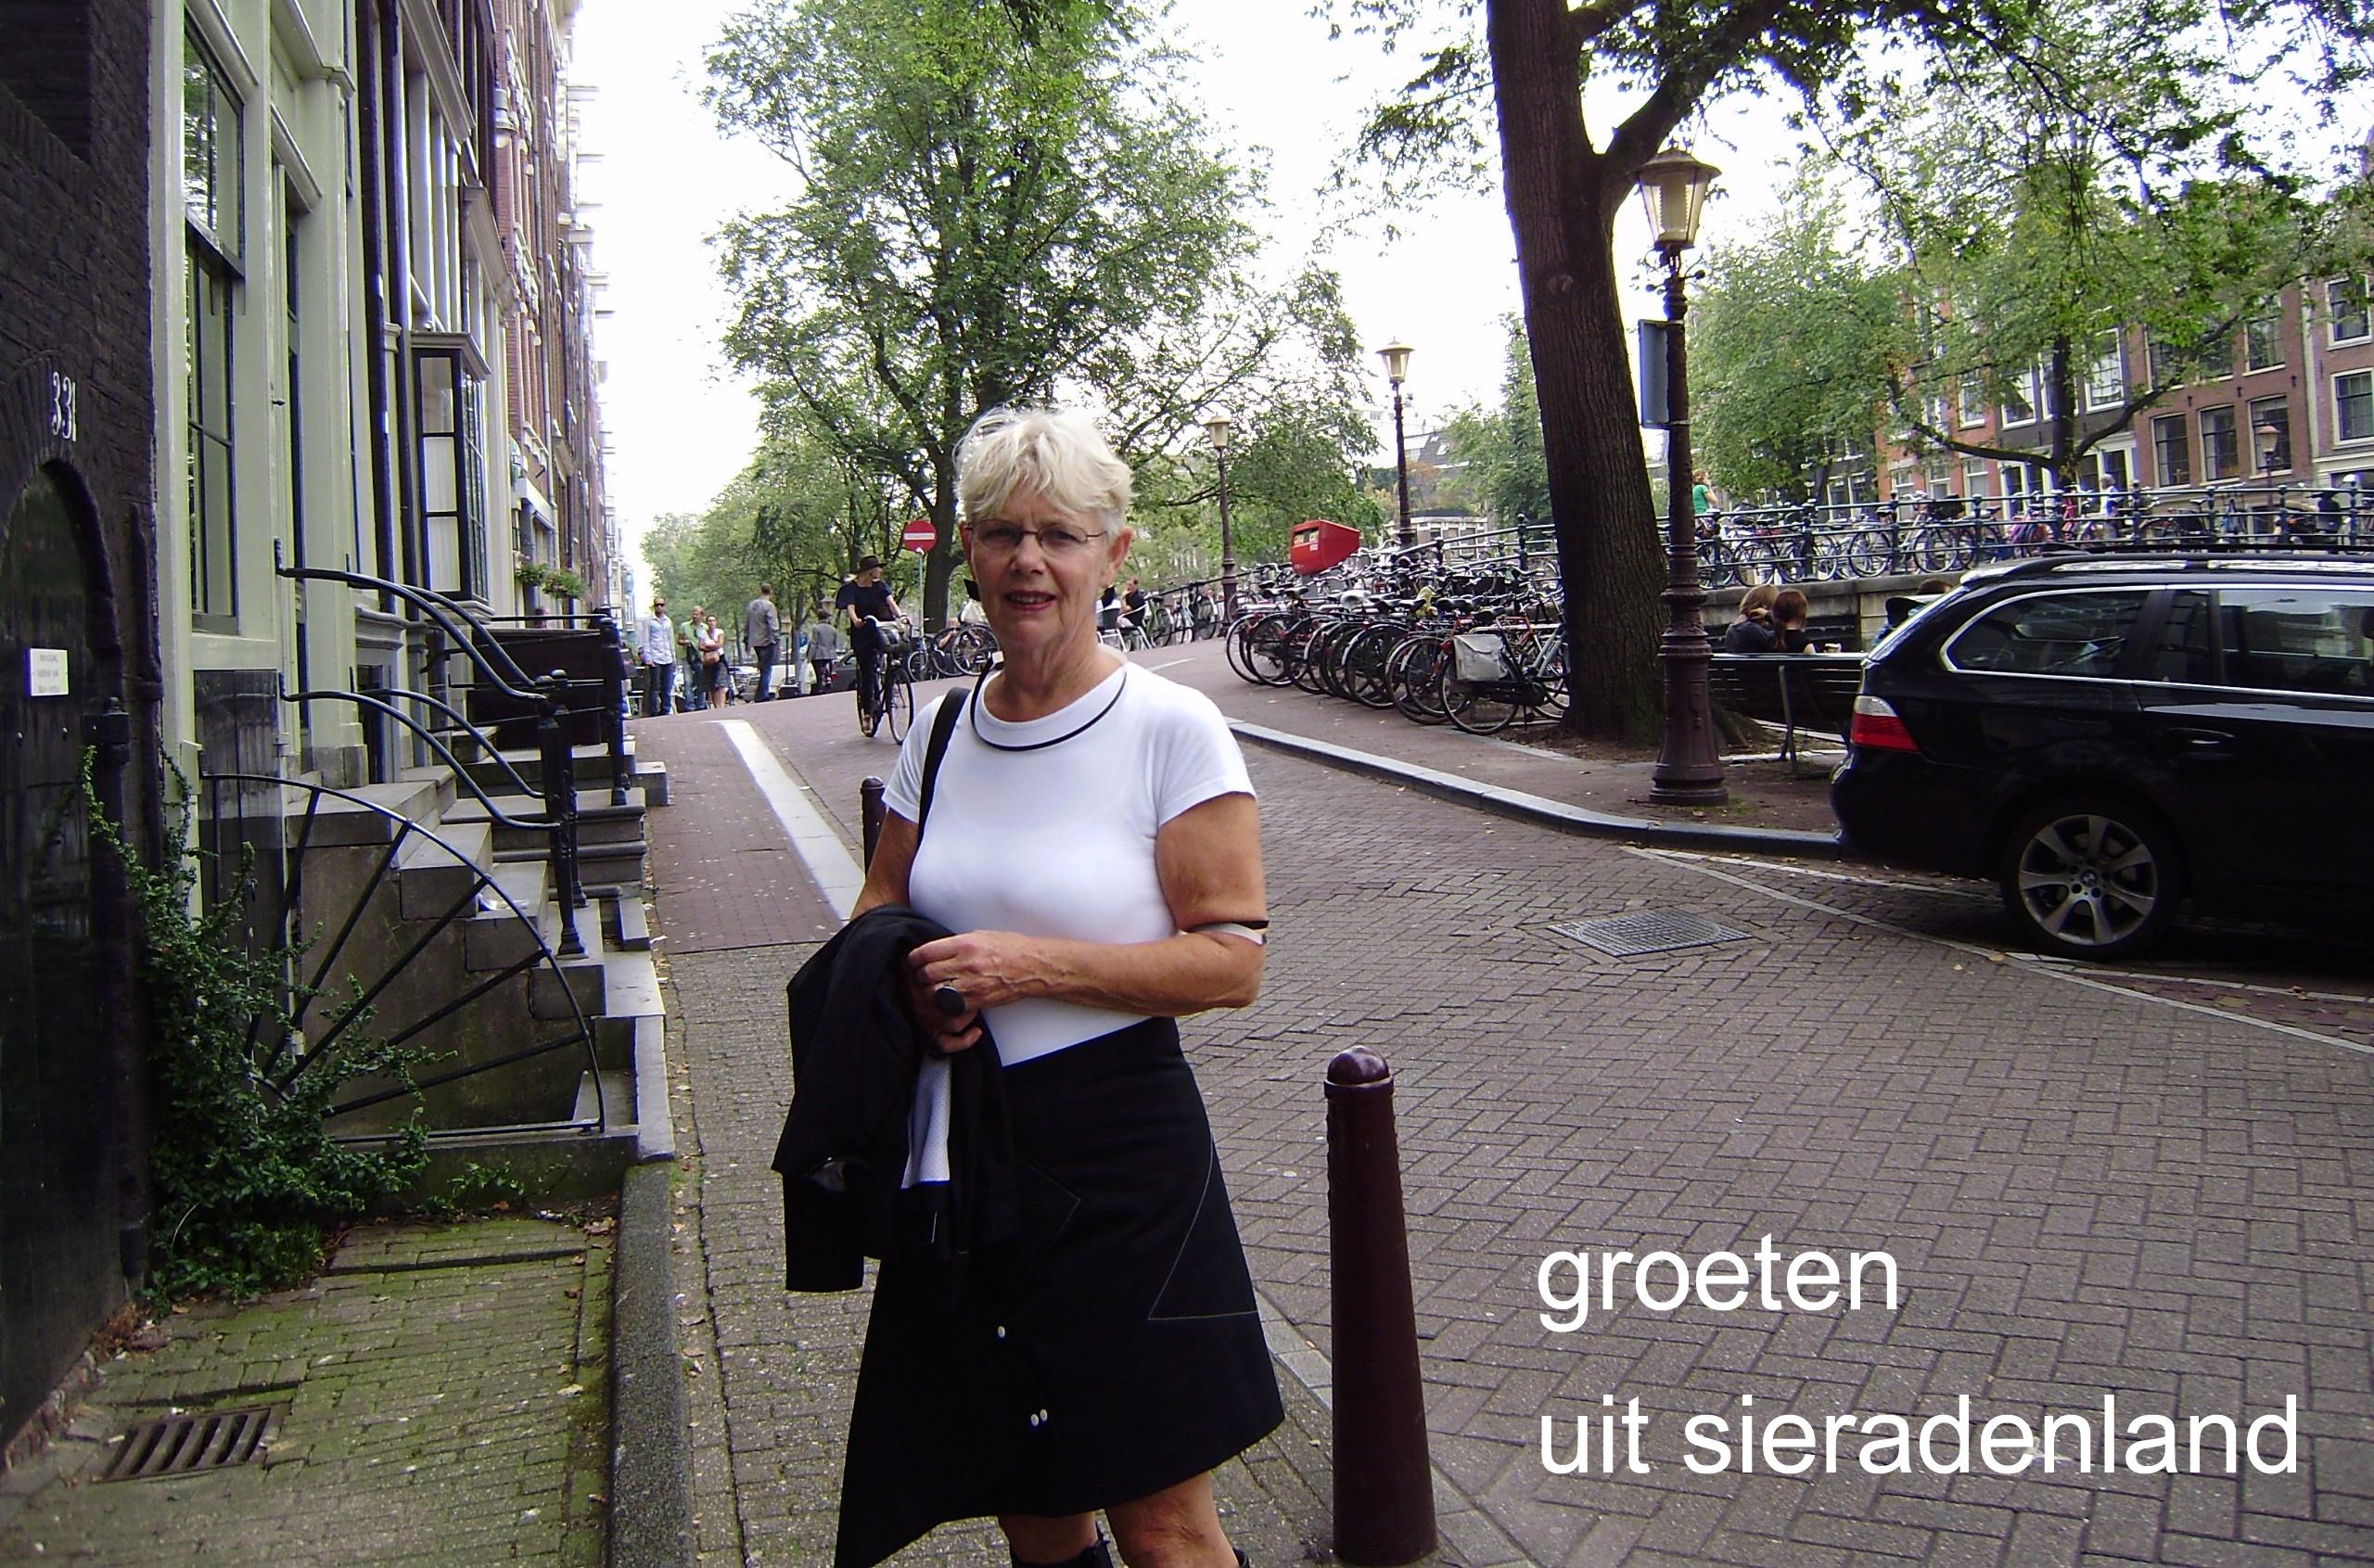 Claartje Keur, Zelfportret met halssieraad van Emmy van Leersum, Amsterdam, 19 september 2009. Foto Claartje Keur